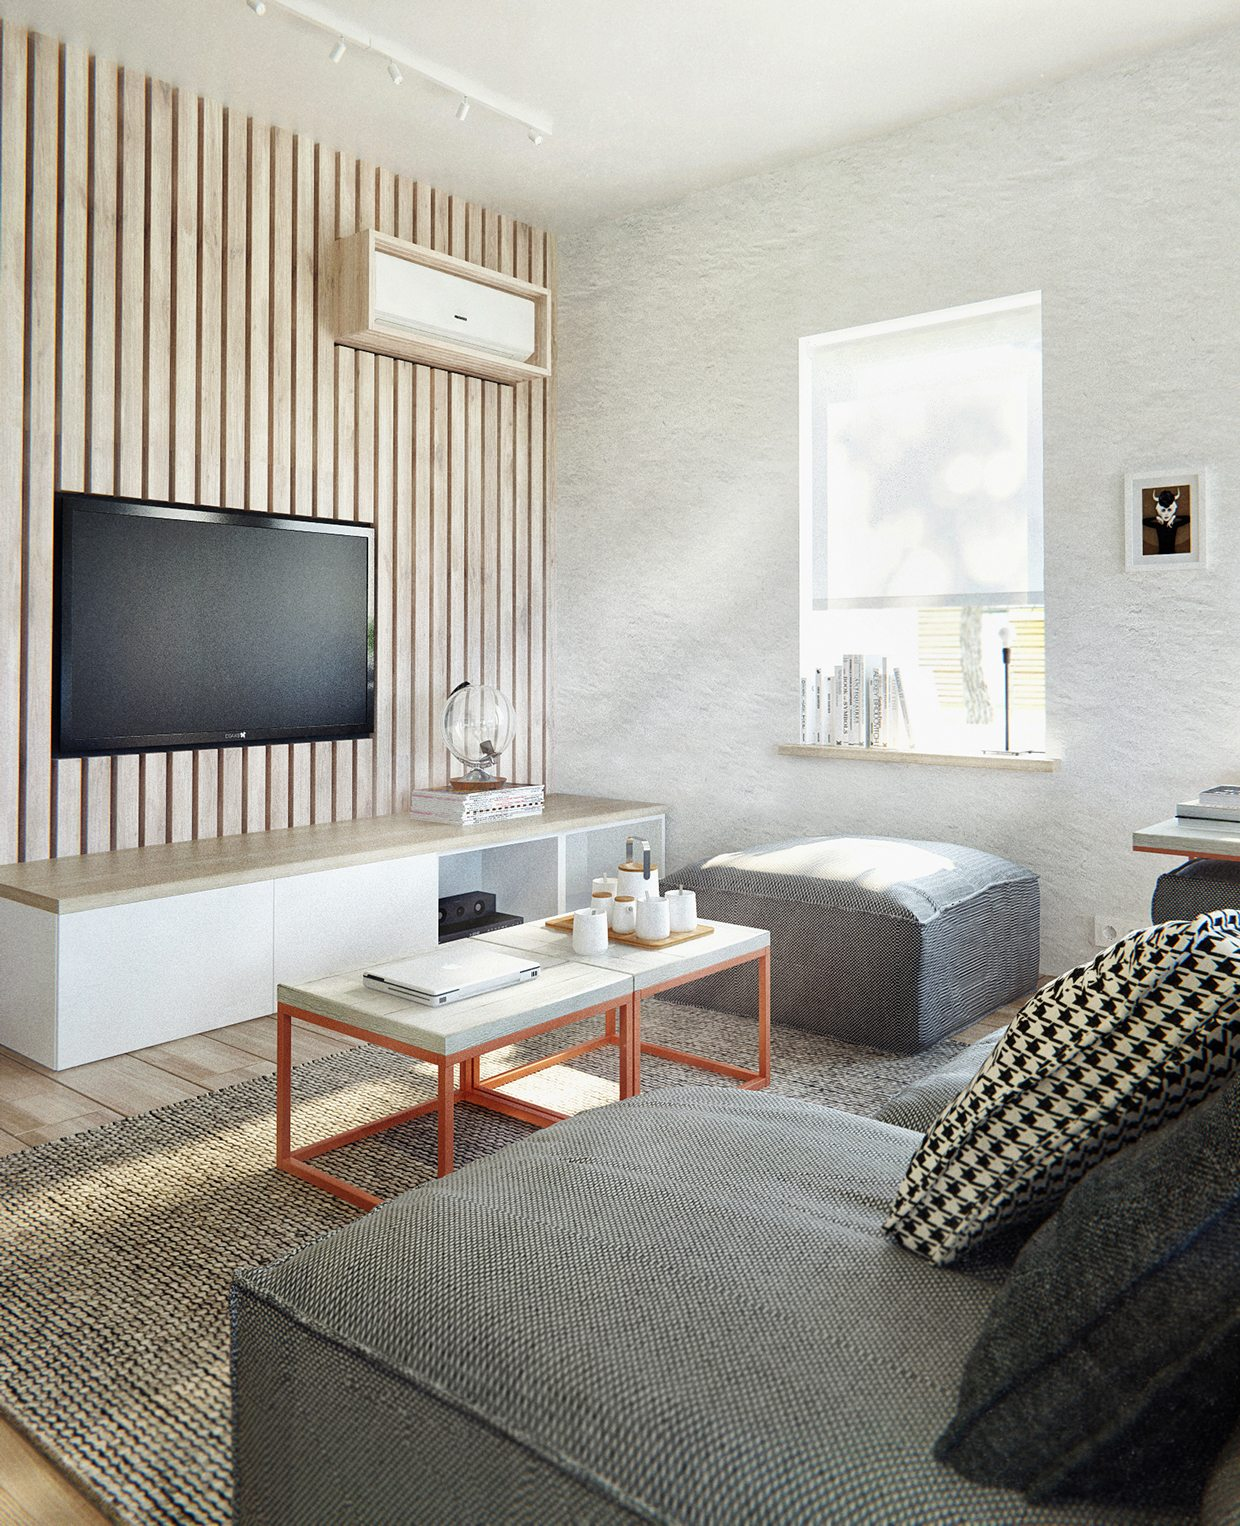 Designing On Wall: Duplex Penthouse With Scandinavian Aesthetics & Industrial